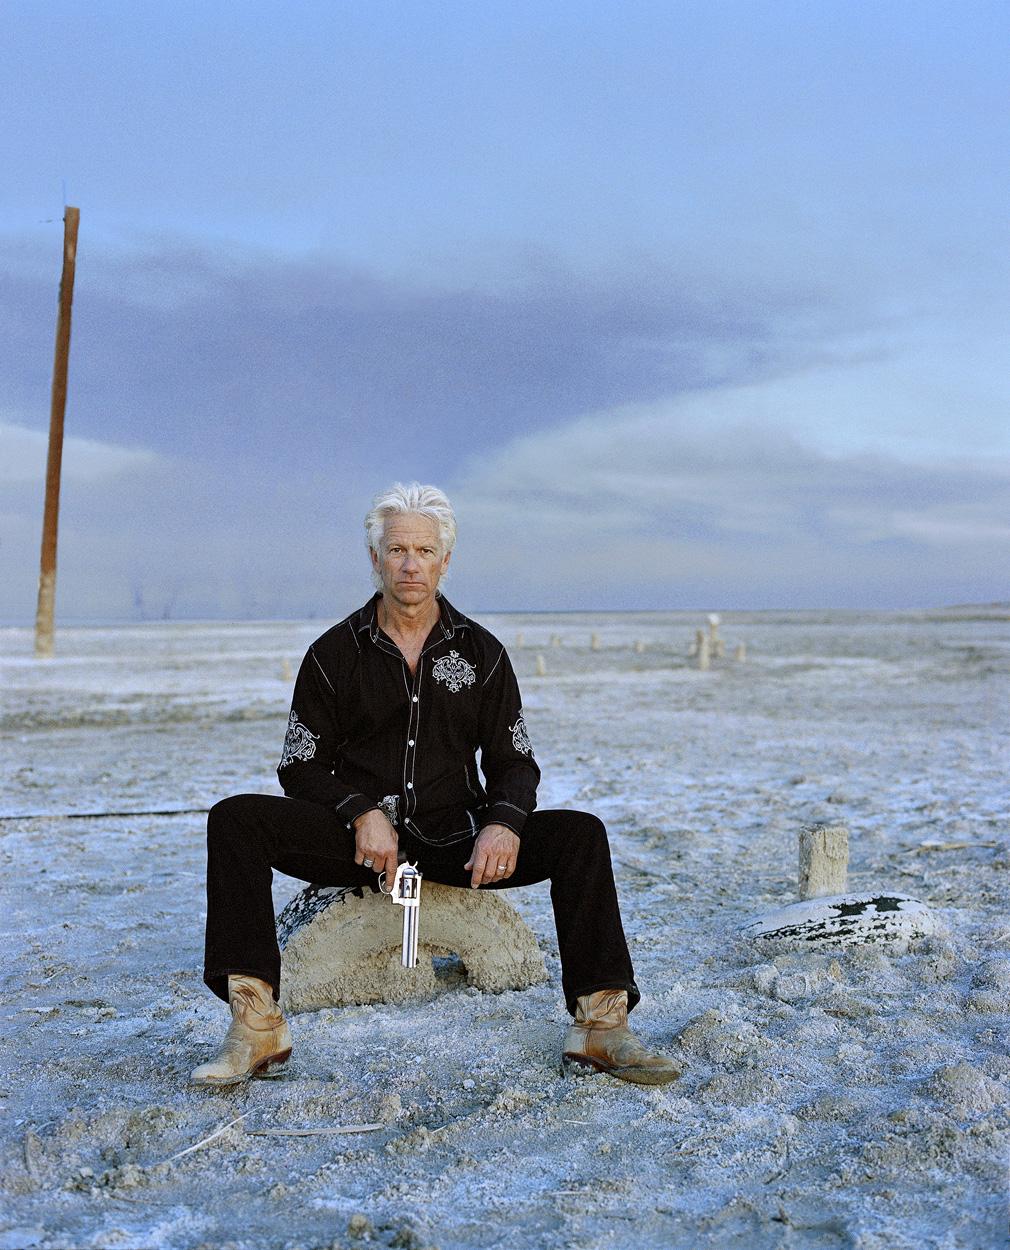 Chris Buck Salton Sea, Chris Buck's Chris Bucks